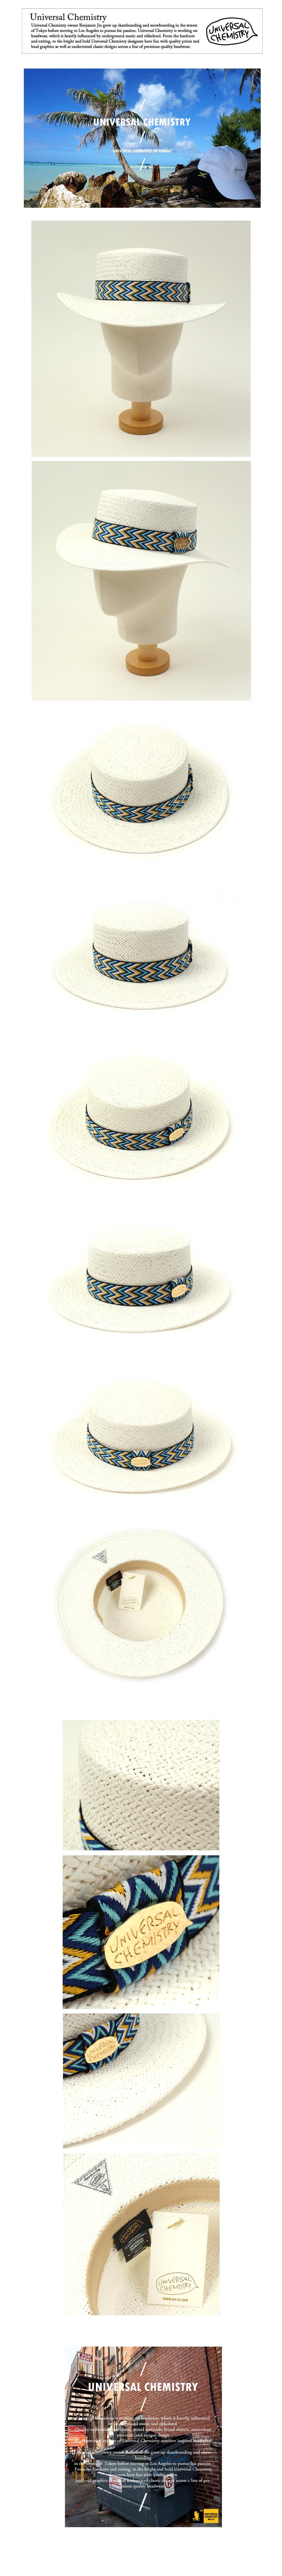 Blue Wave Line White Panama Hat 여름페도라